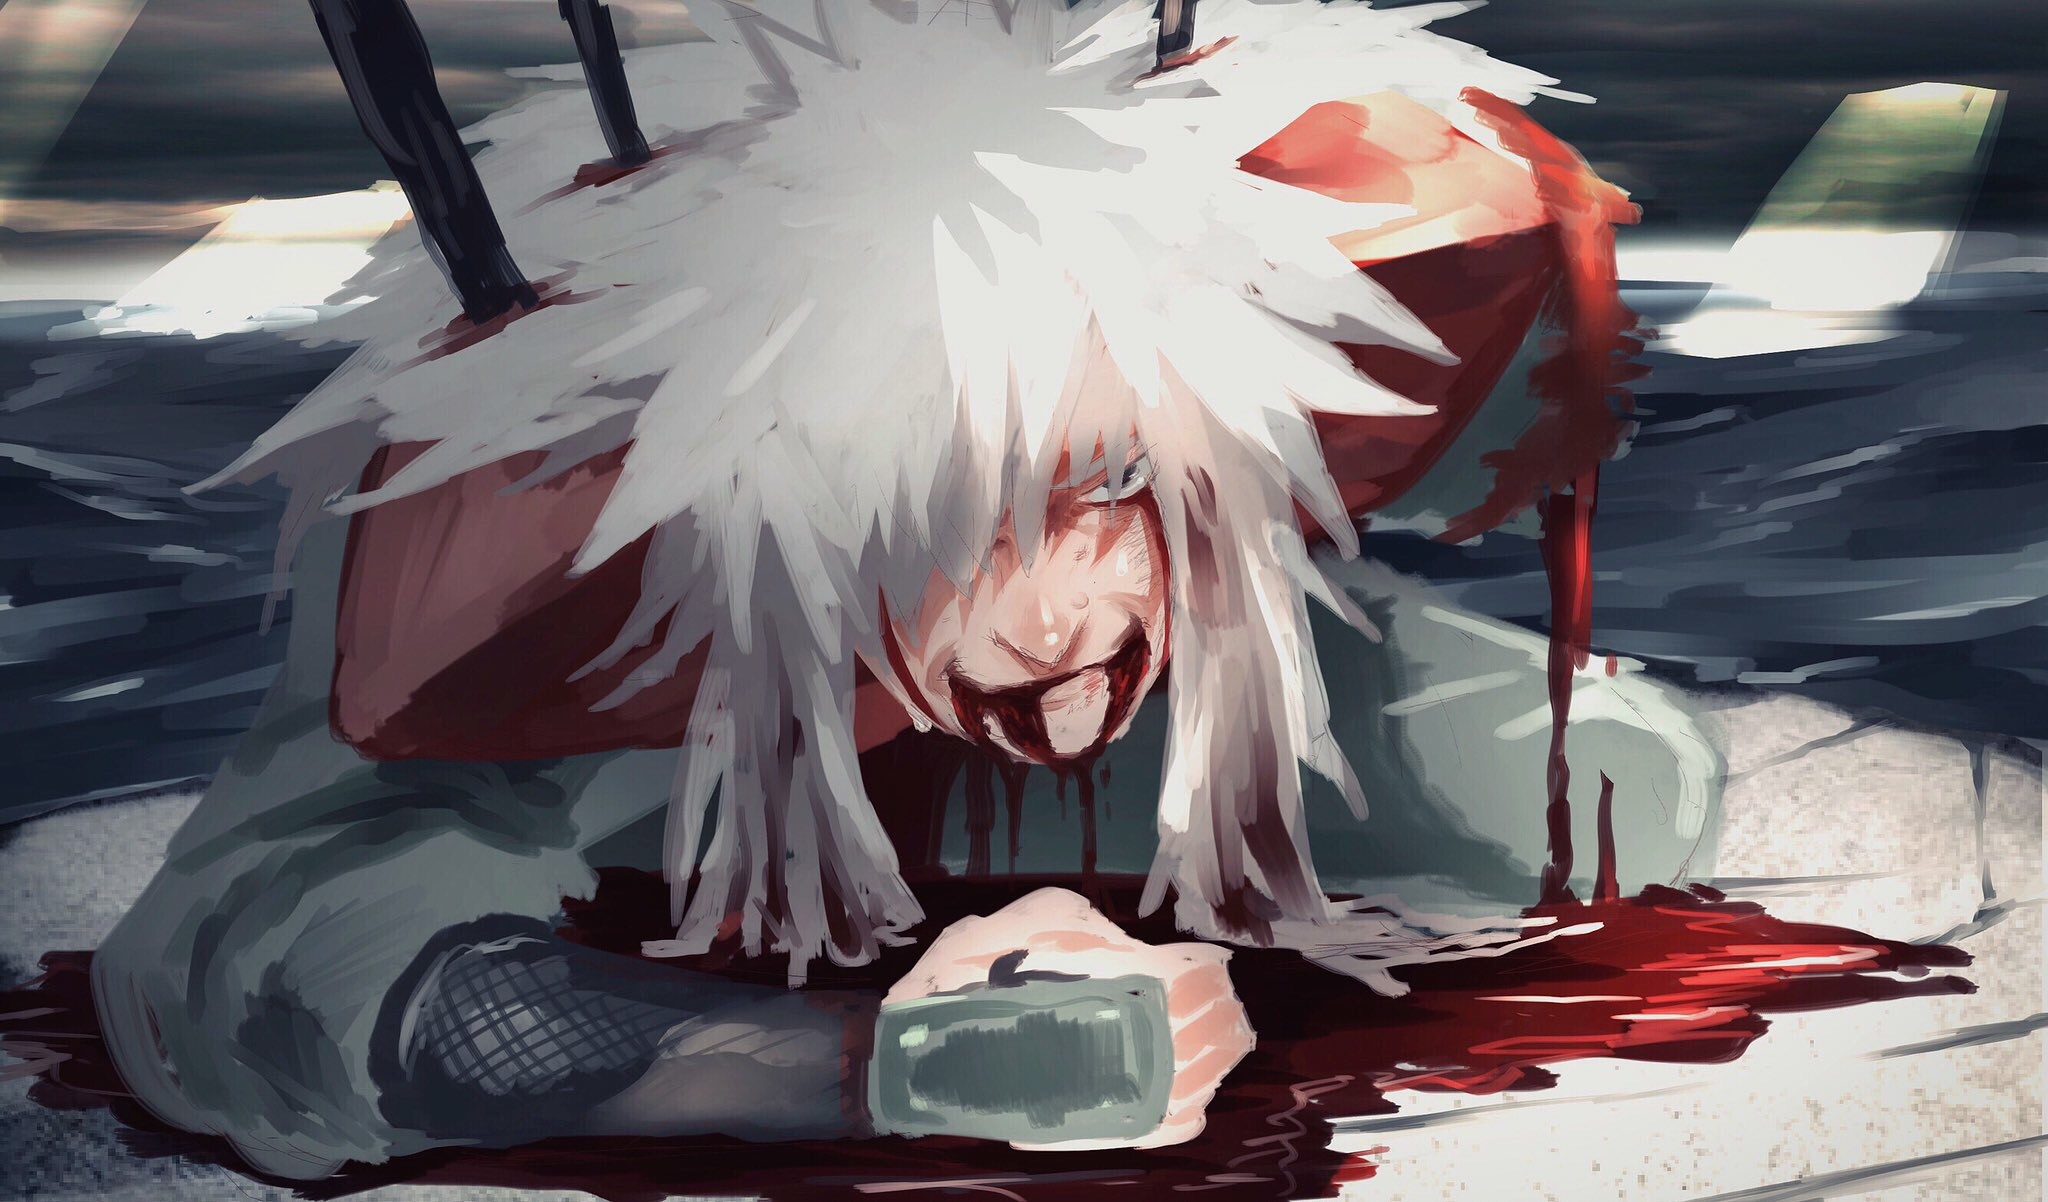 Jiraiya Naruto Image 2443240 Zerochan Anime Image Board